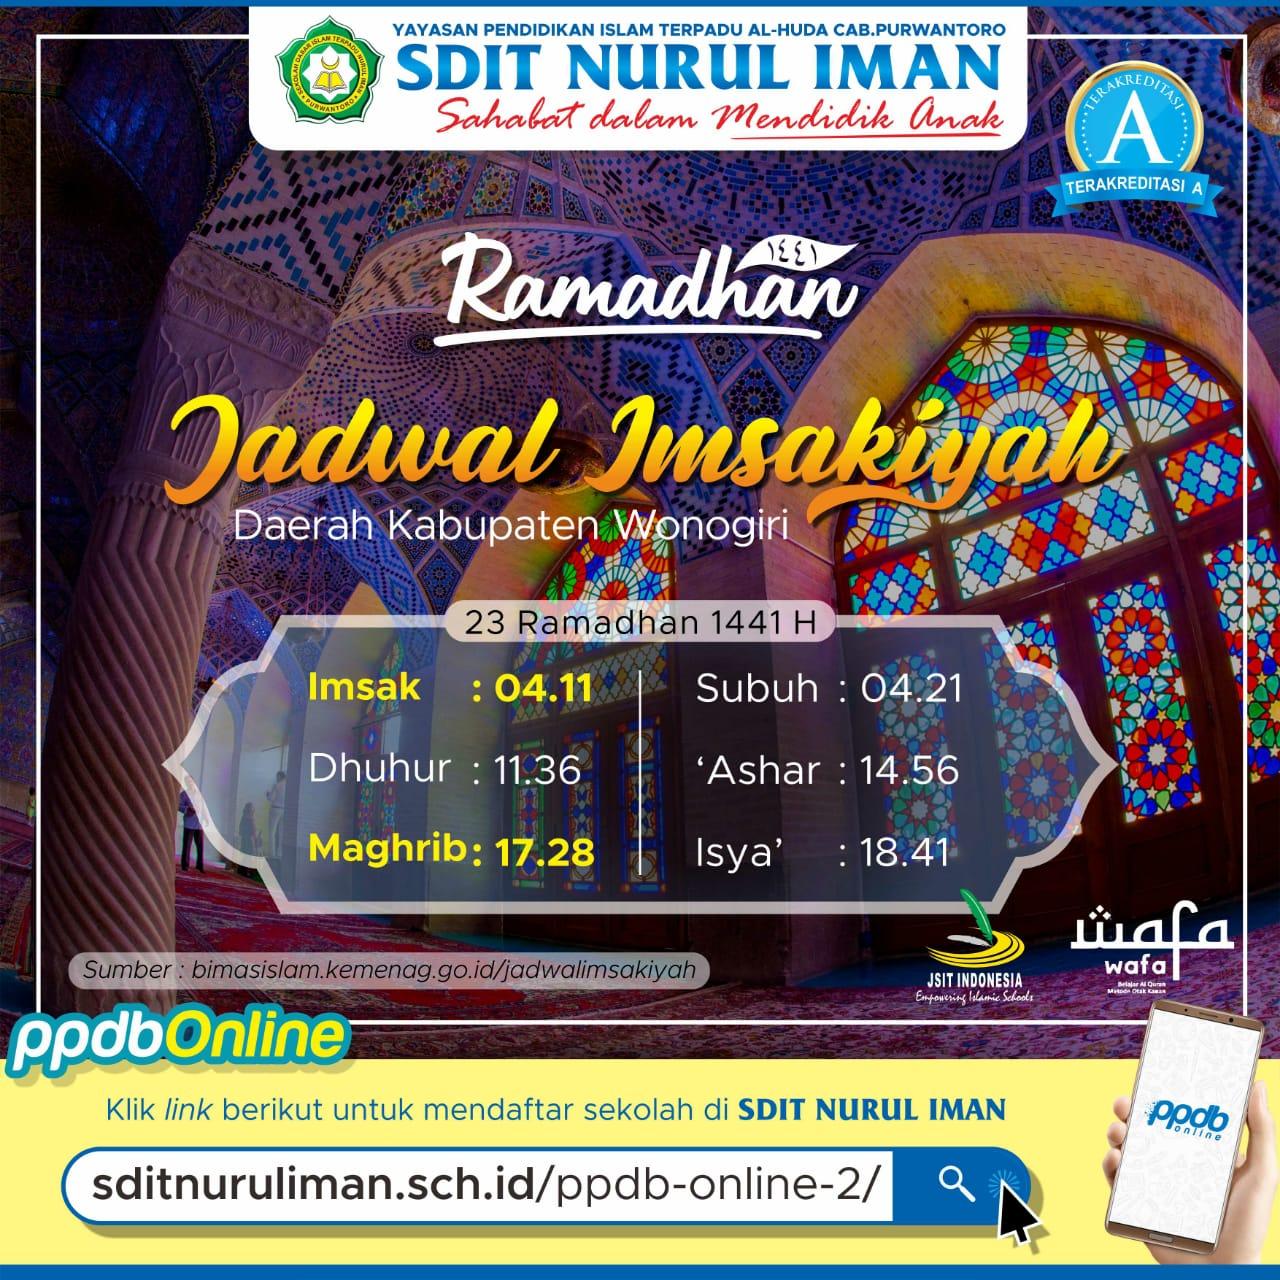 23 Ramadhan 1441 H